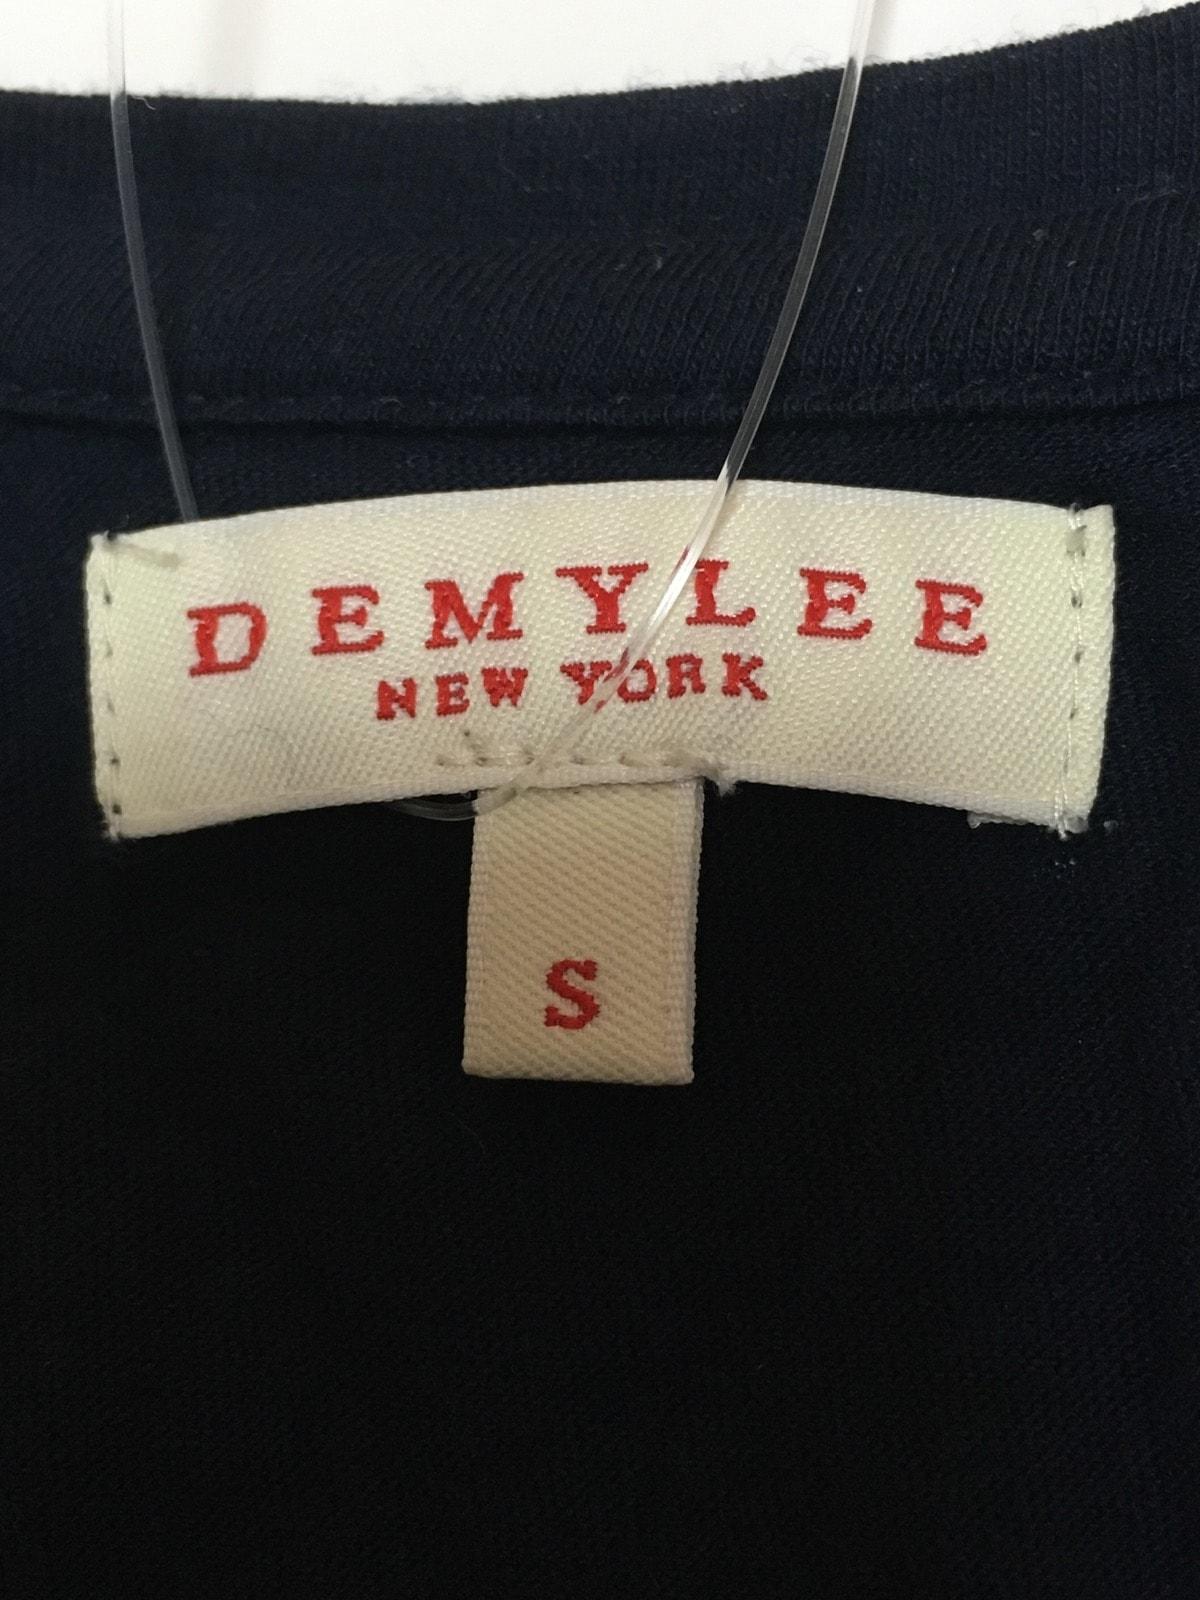 demylee(デミリー)のワンピース